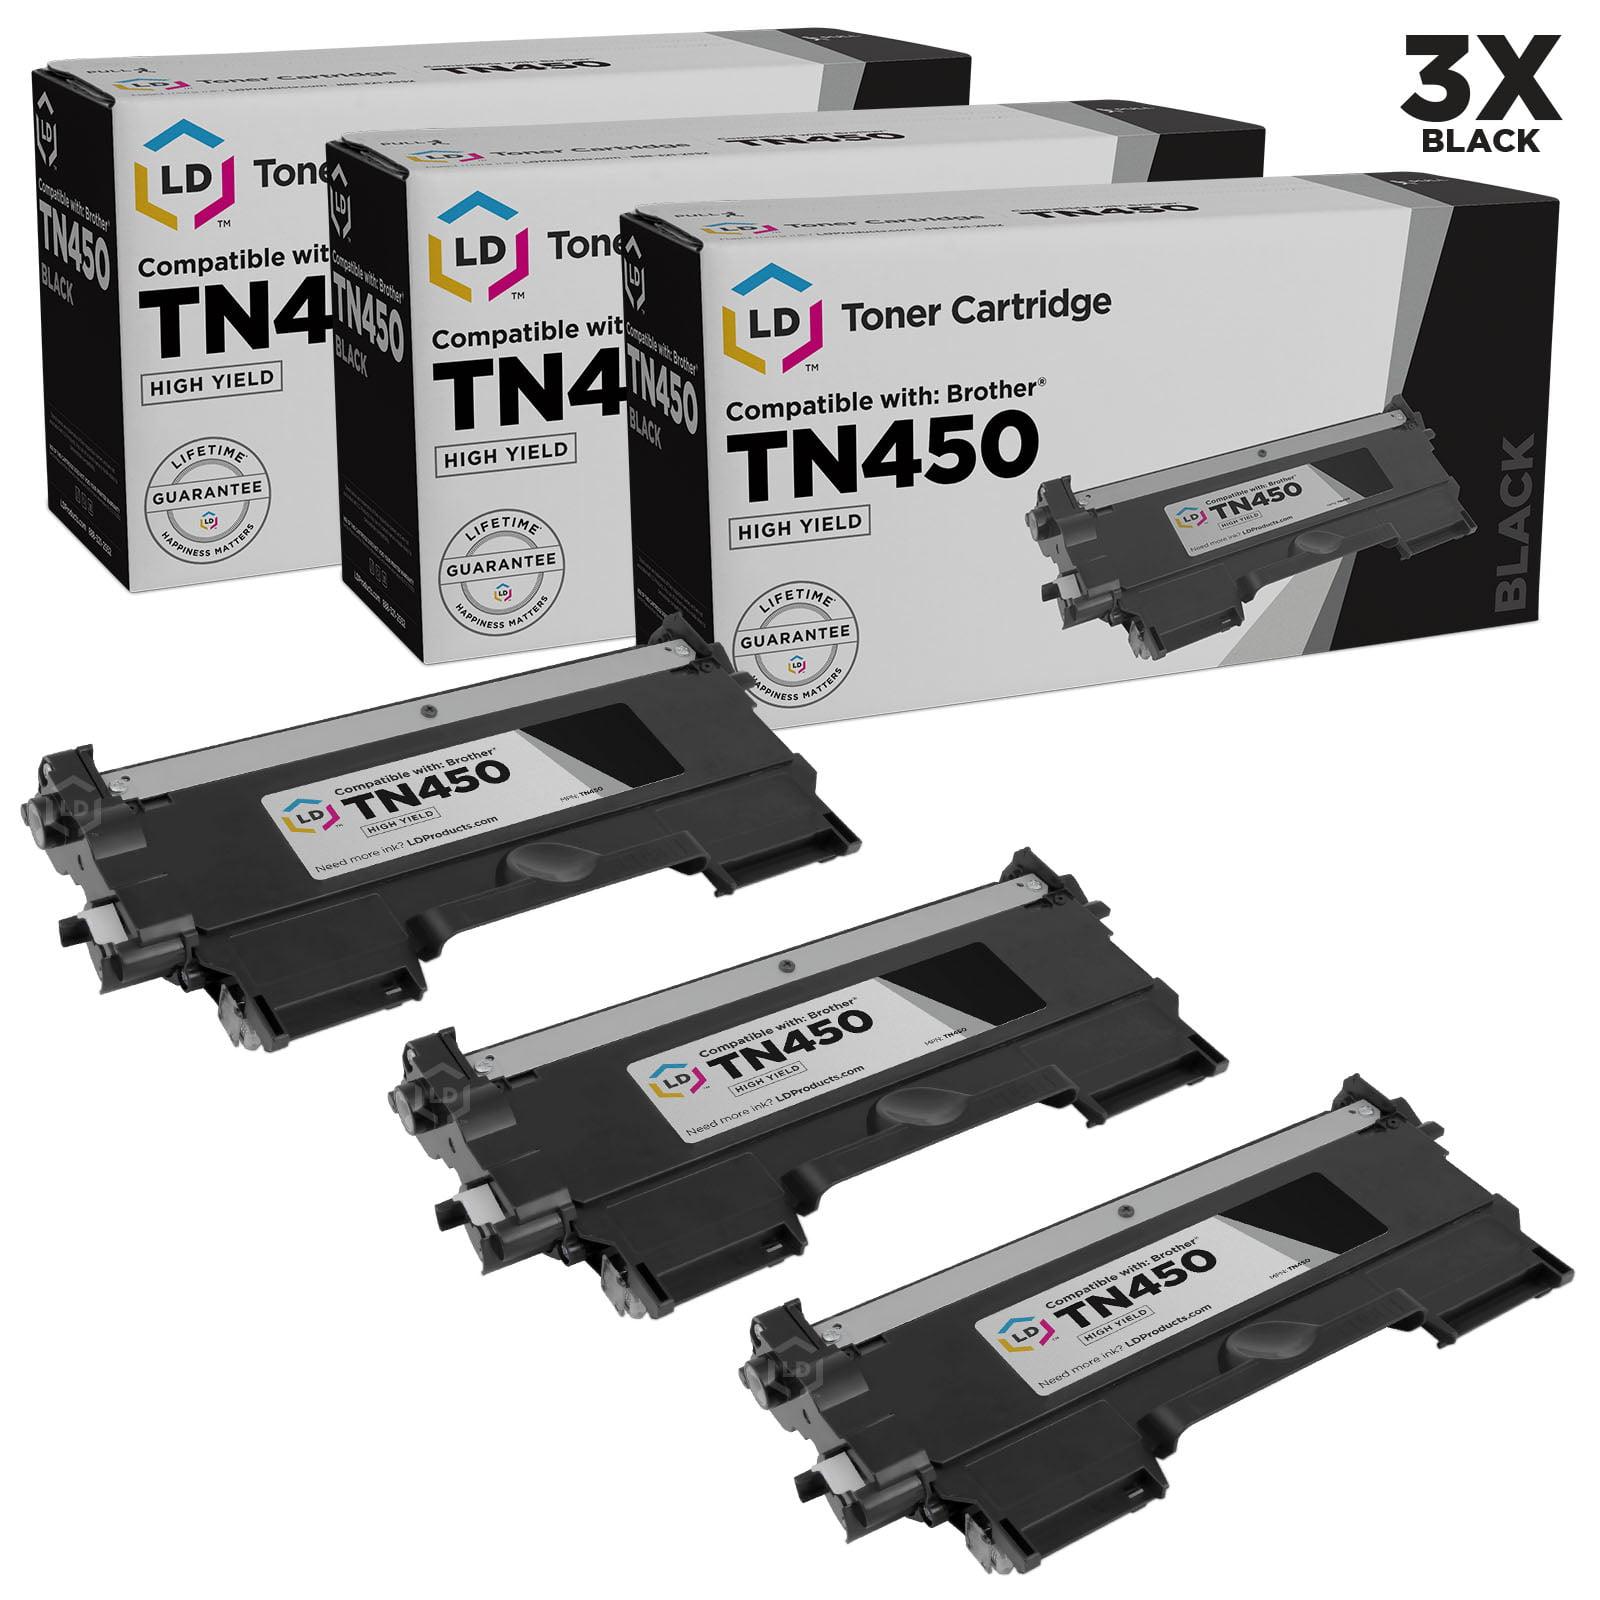 Compatible Brother Set of 3 TN450 High Yield Toner Cartridges TN-450 TN420 TN-420 MFC-7360N HL-2240 DCP-7060D DCP-7065DN HL-2280DW HL-2275DW HL-2270DW HL-2242D Intellifax 2840 2940